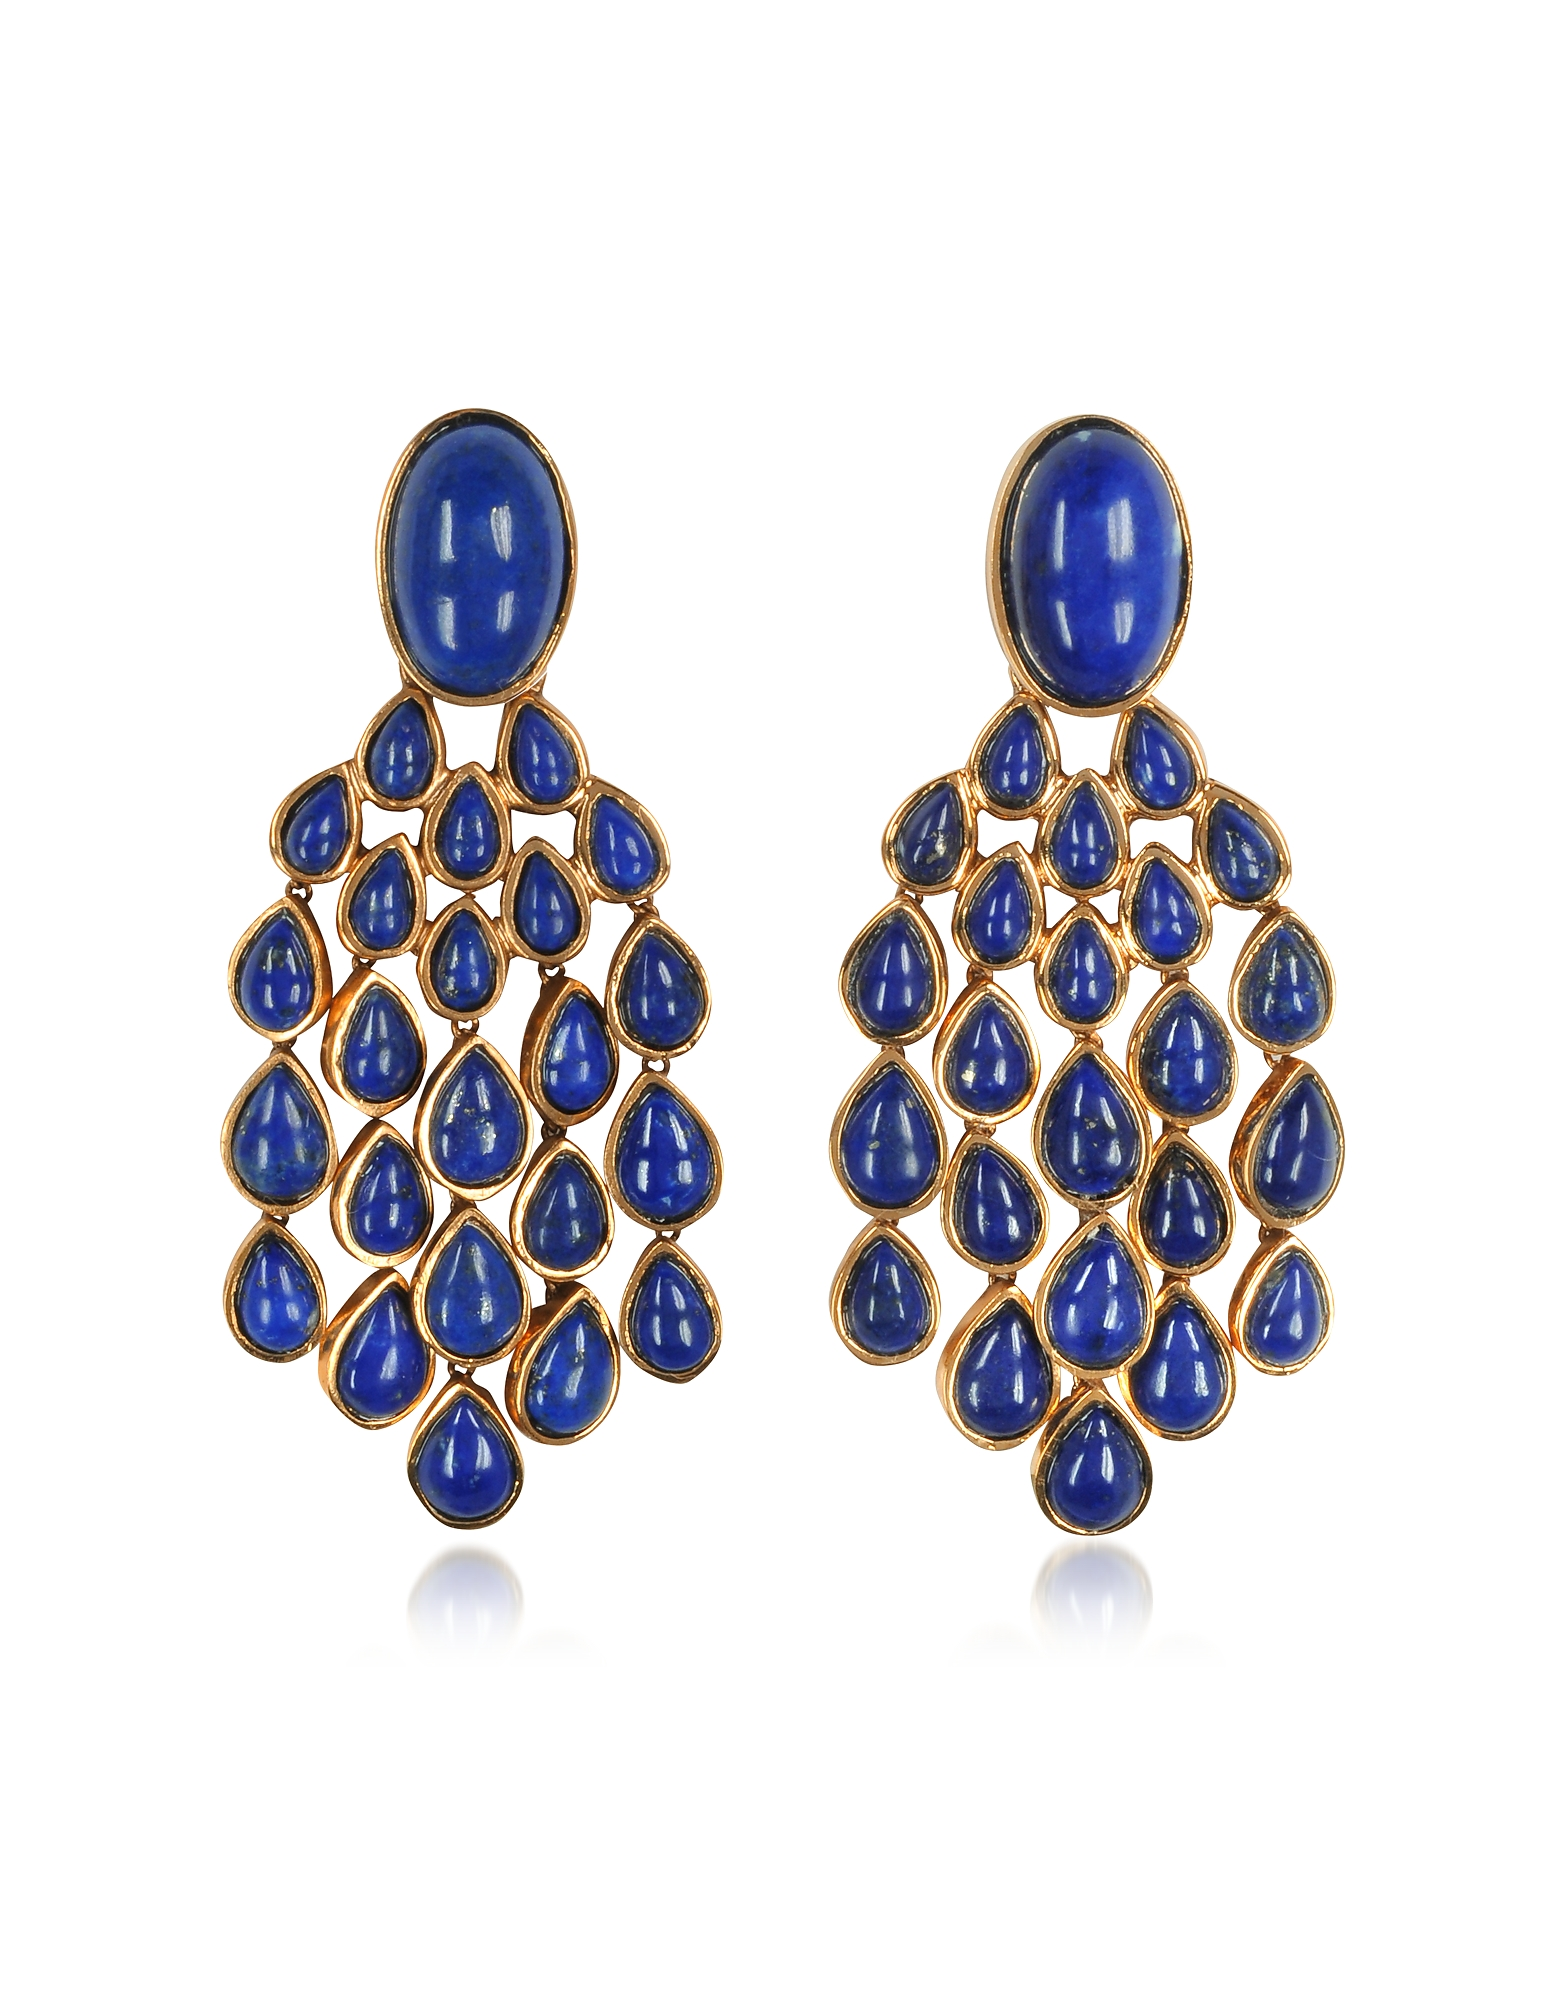 Aurelie Bidermann Earrings, Cherokee 18K Gold-Plated Drop Earrings w/Lapis Lazuli Stones